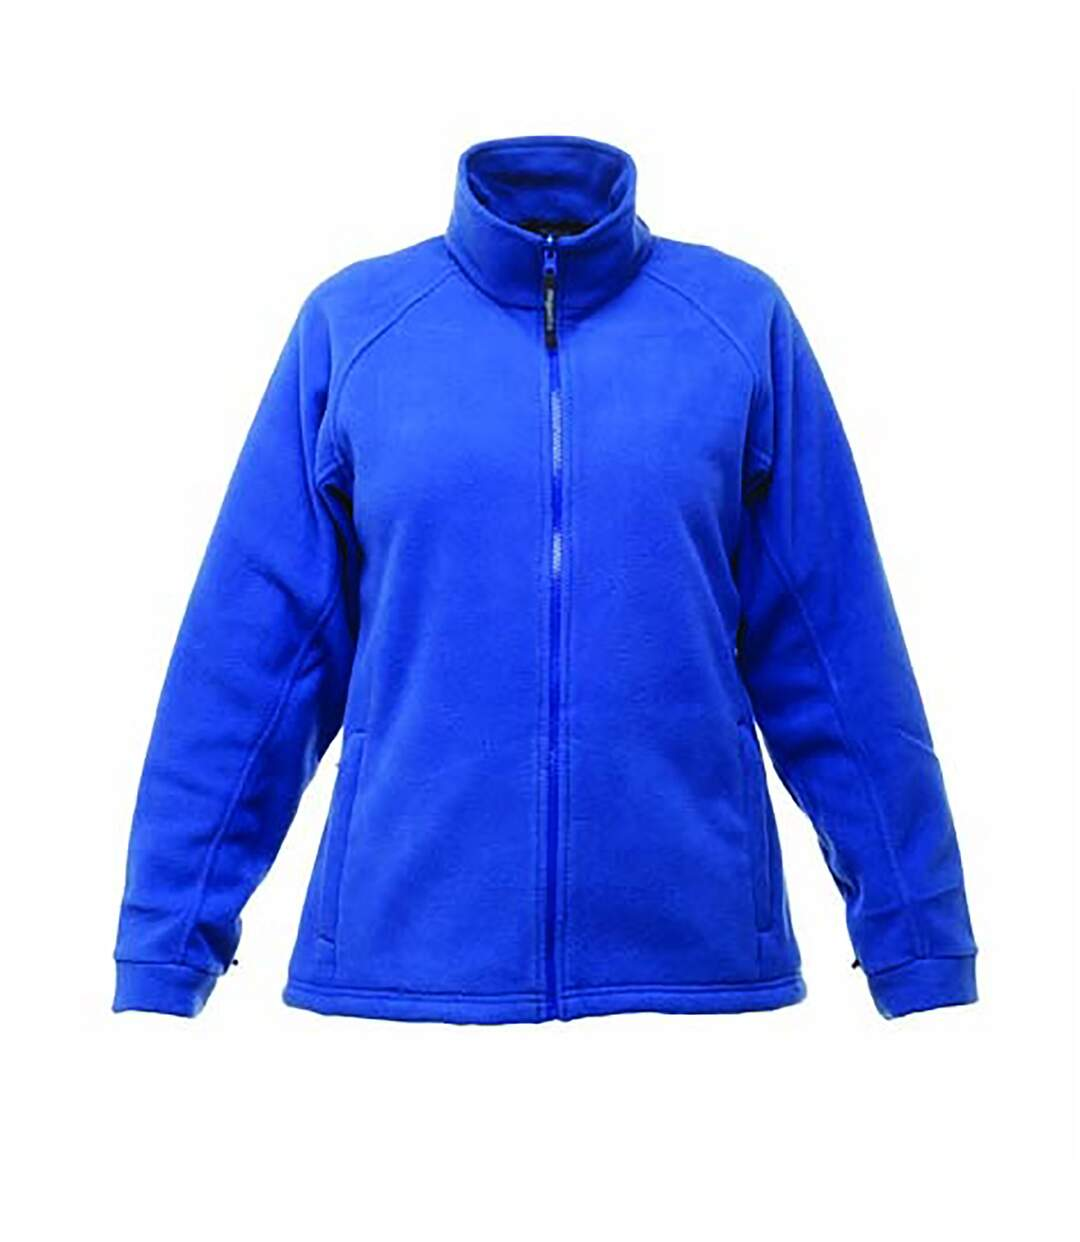 Regatta - Polaire THOR - Homme (Bleu) - UTRG1486